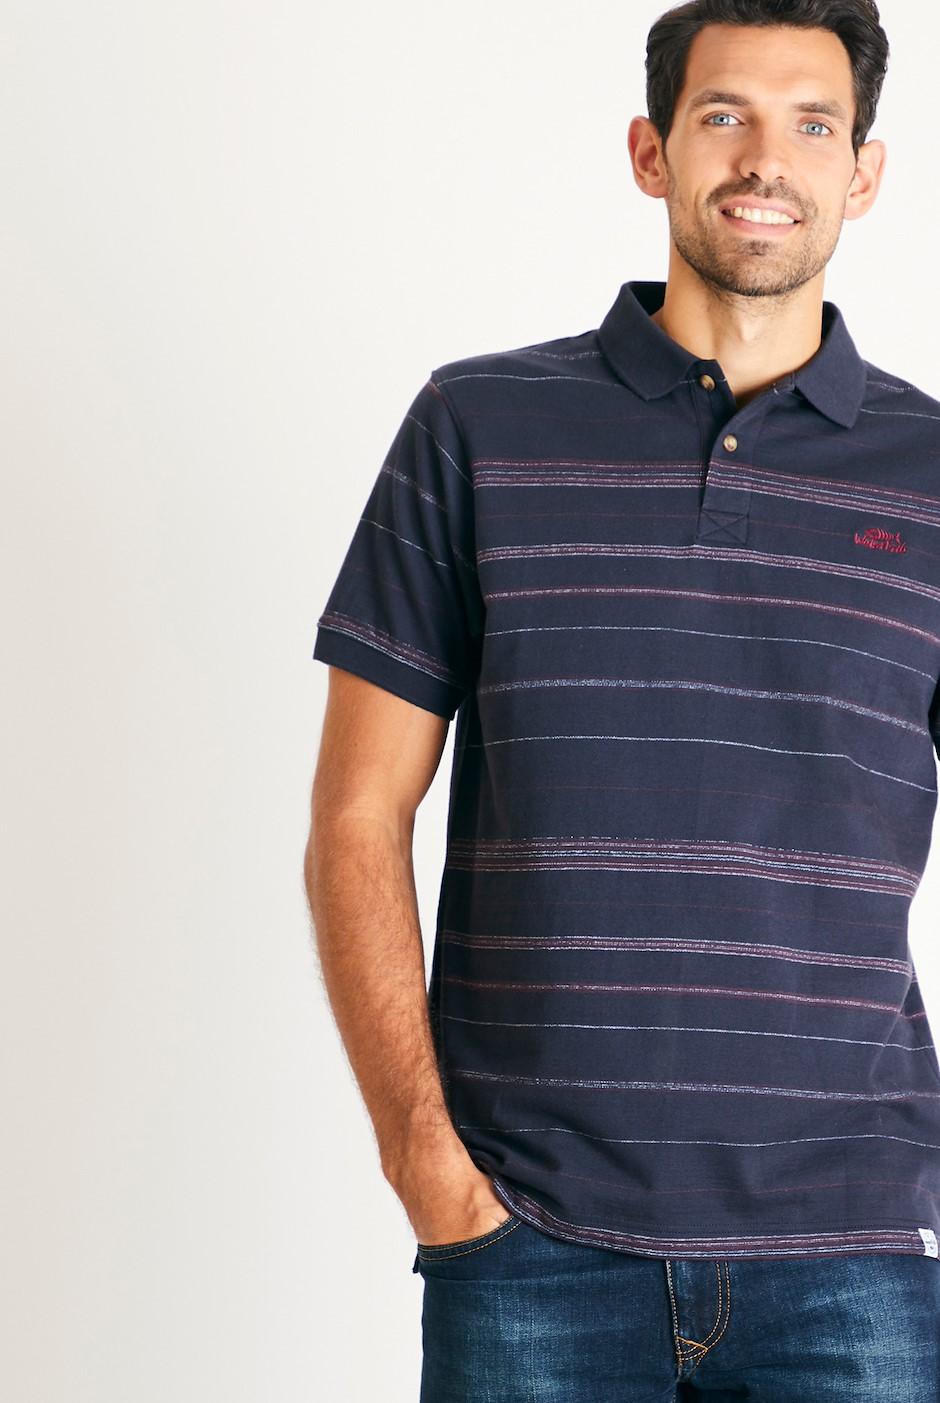 Draycott Stripe Jacquard Polo Shirt Washed Black